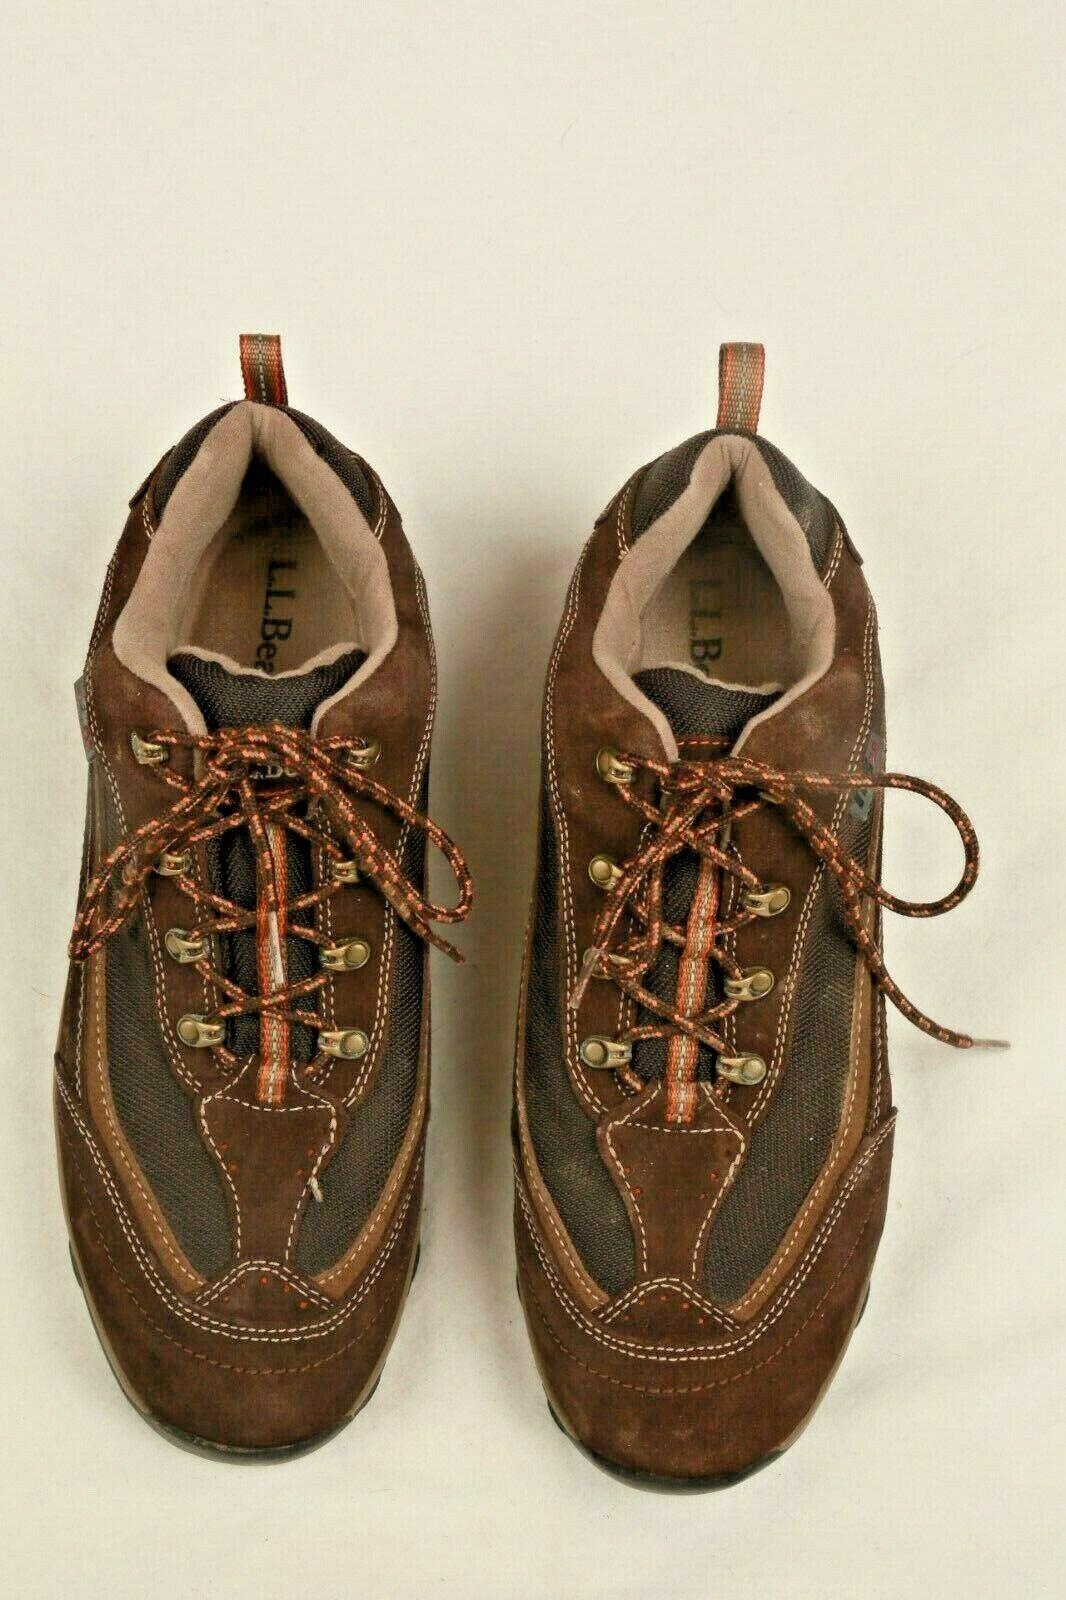 LL BEAN TRAIL HIKING TEK 2.5 WATERPROOF scarpe da ginnastica scarpe Marronee SUEDE MENS 11 M EUC